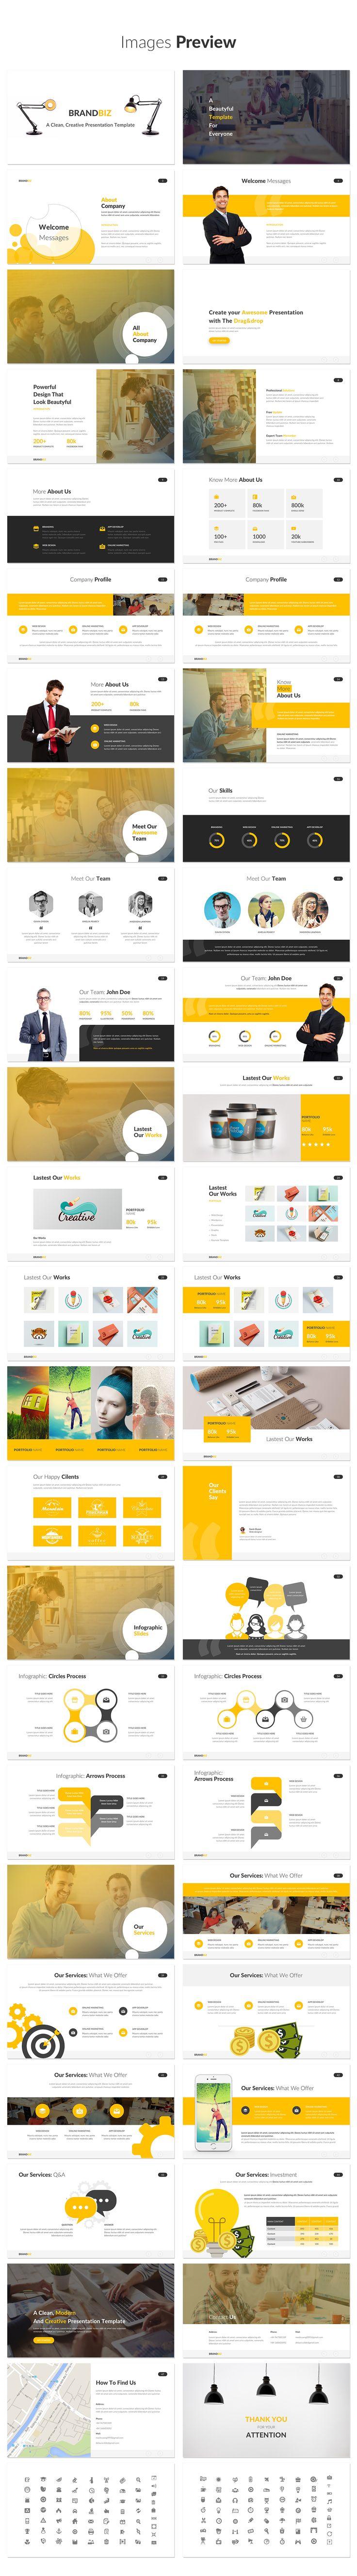 233 best powerpoint images on pinterest presentation design